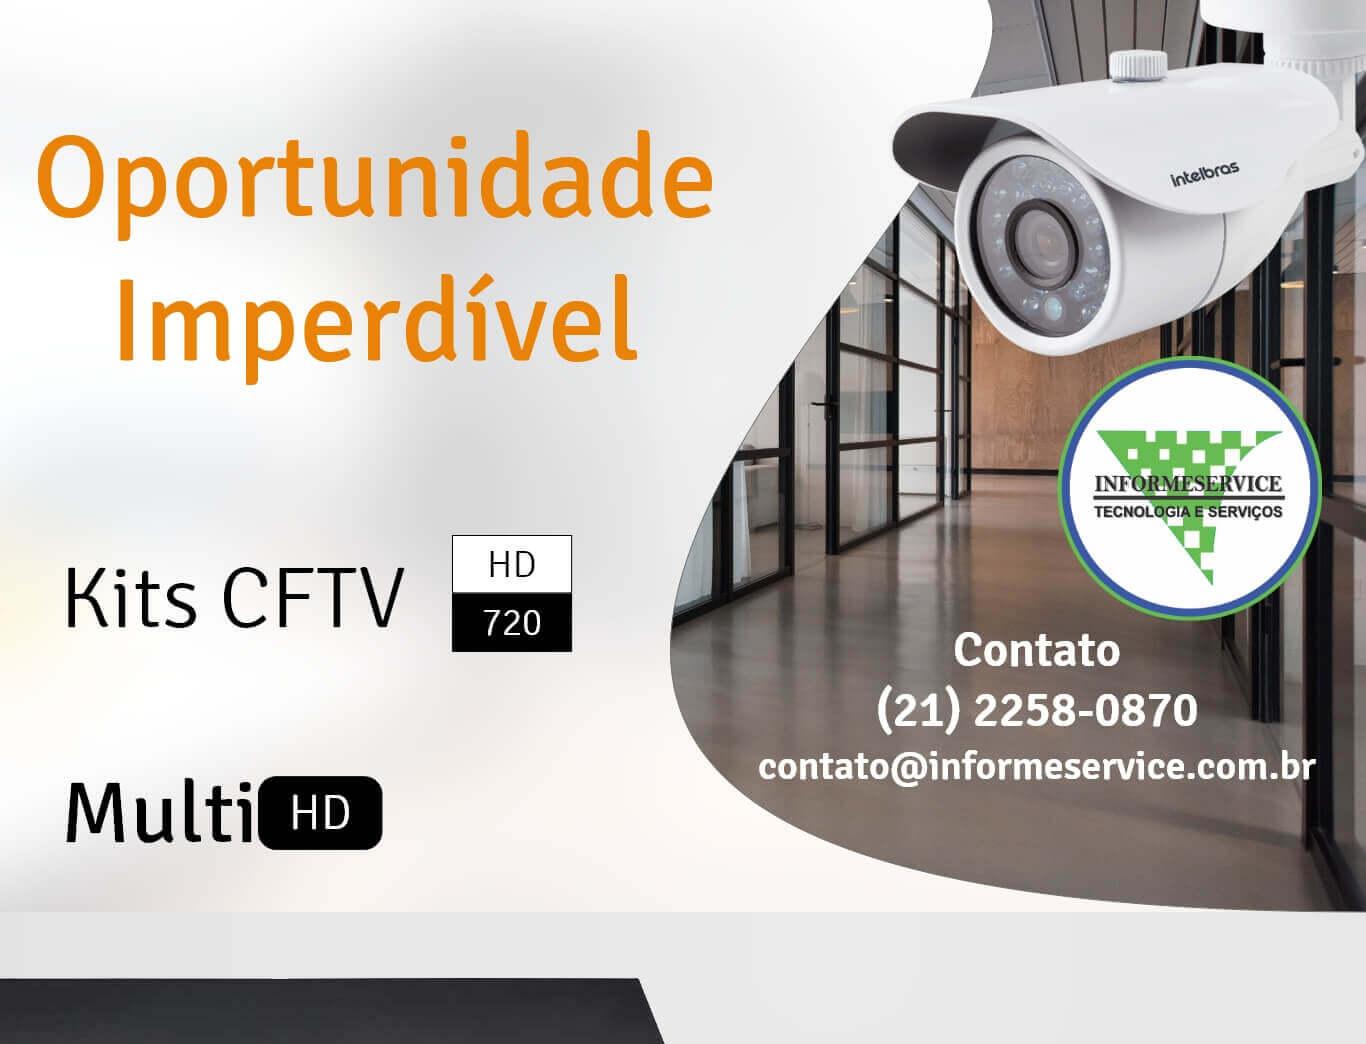 Kit CFTV – Oportunidade Imperdível